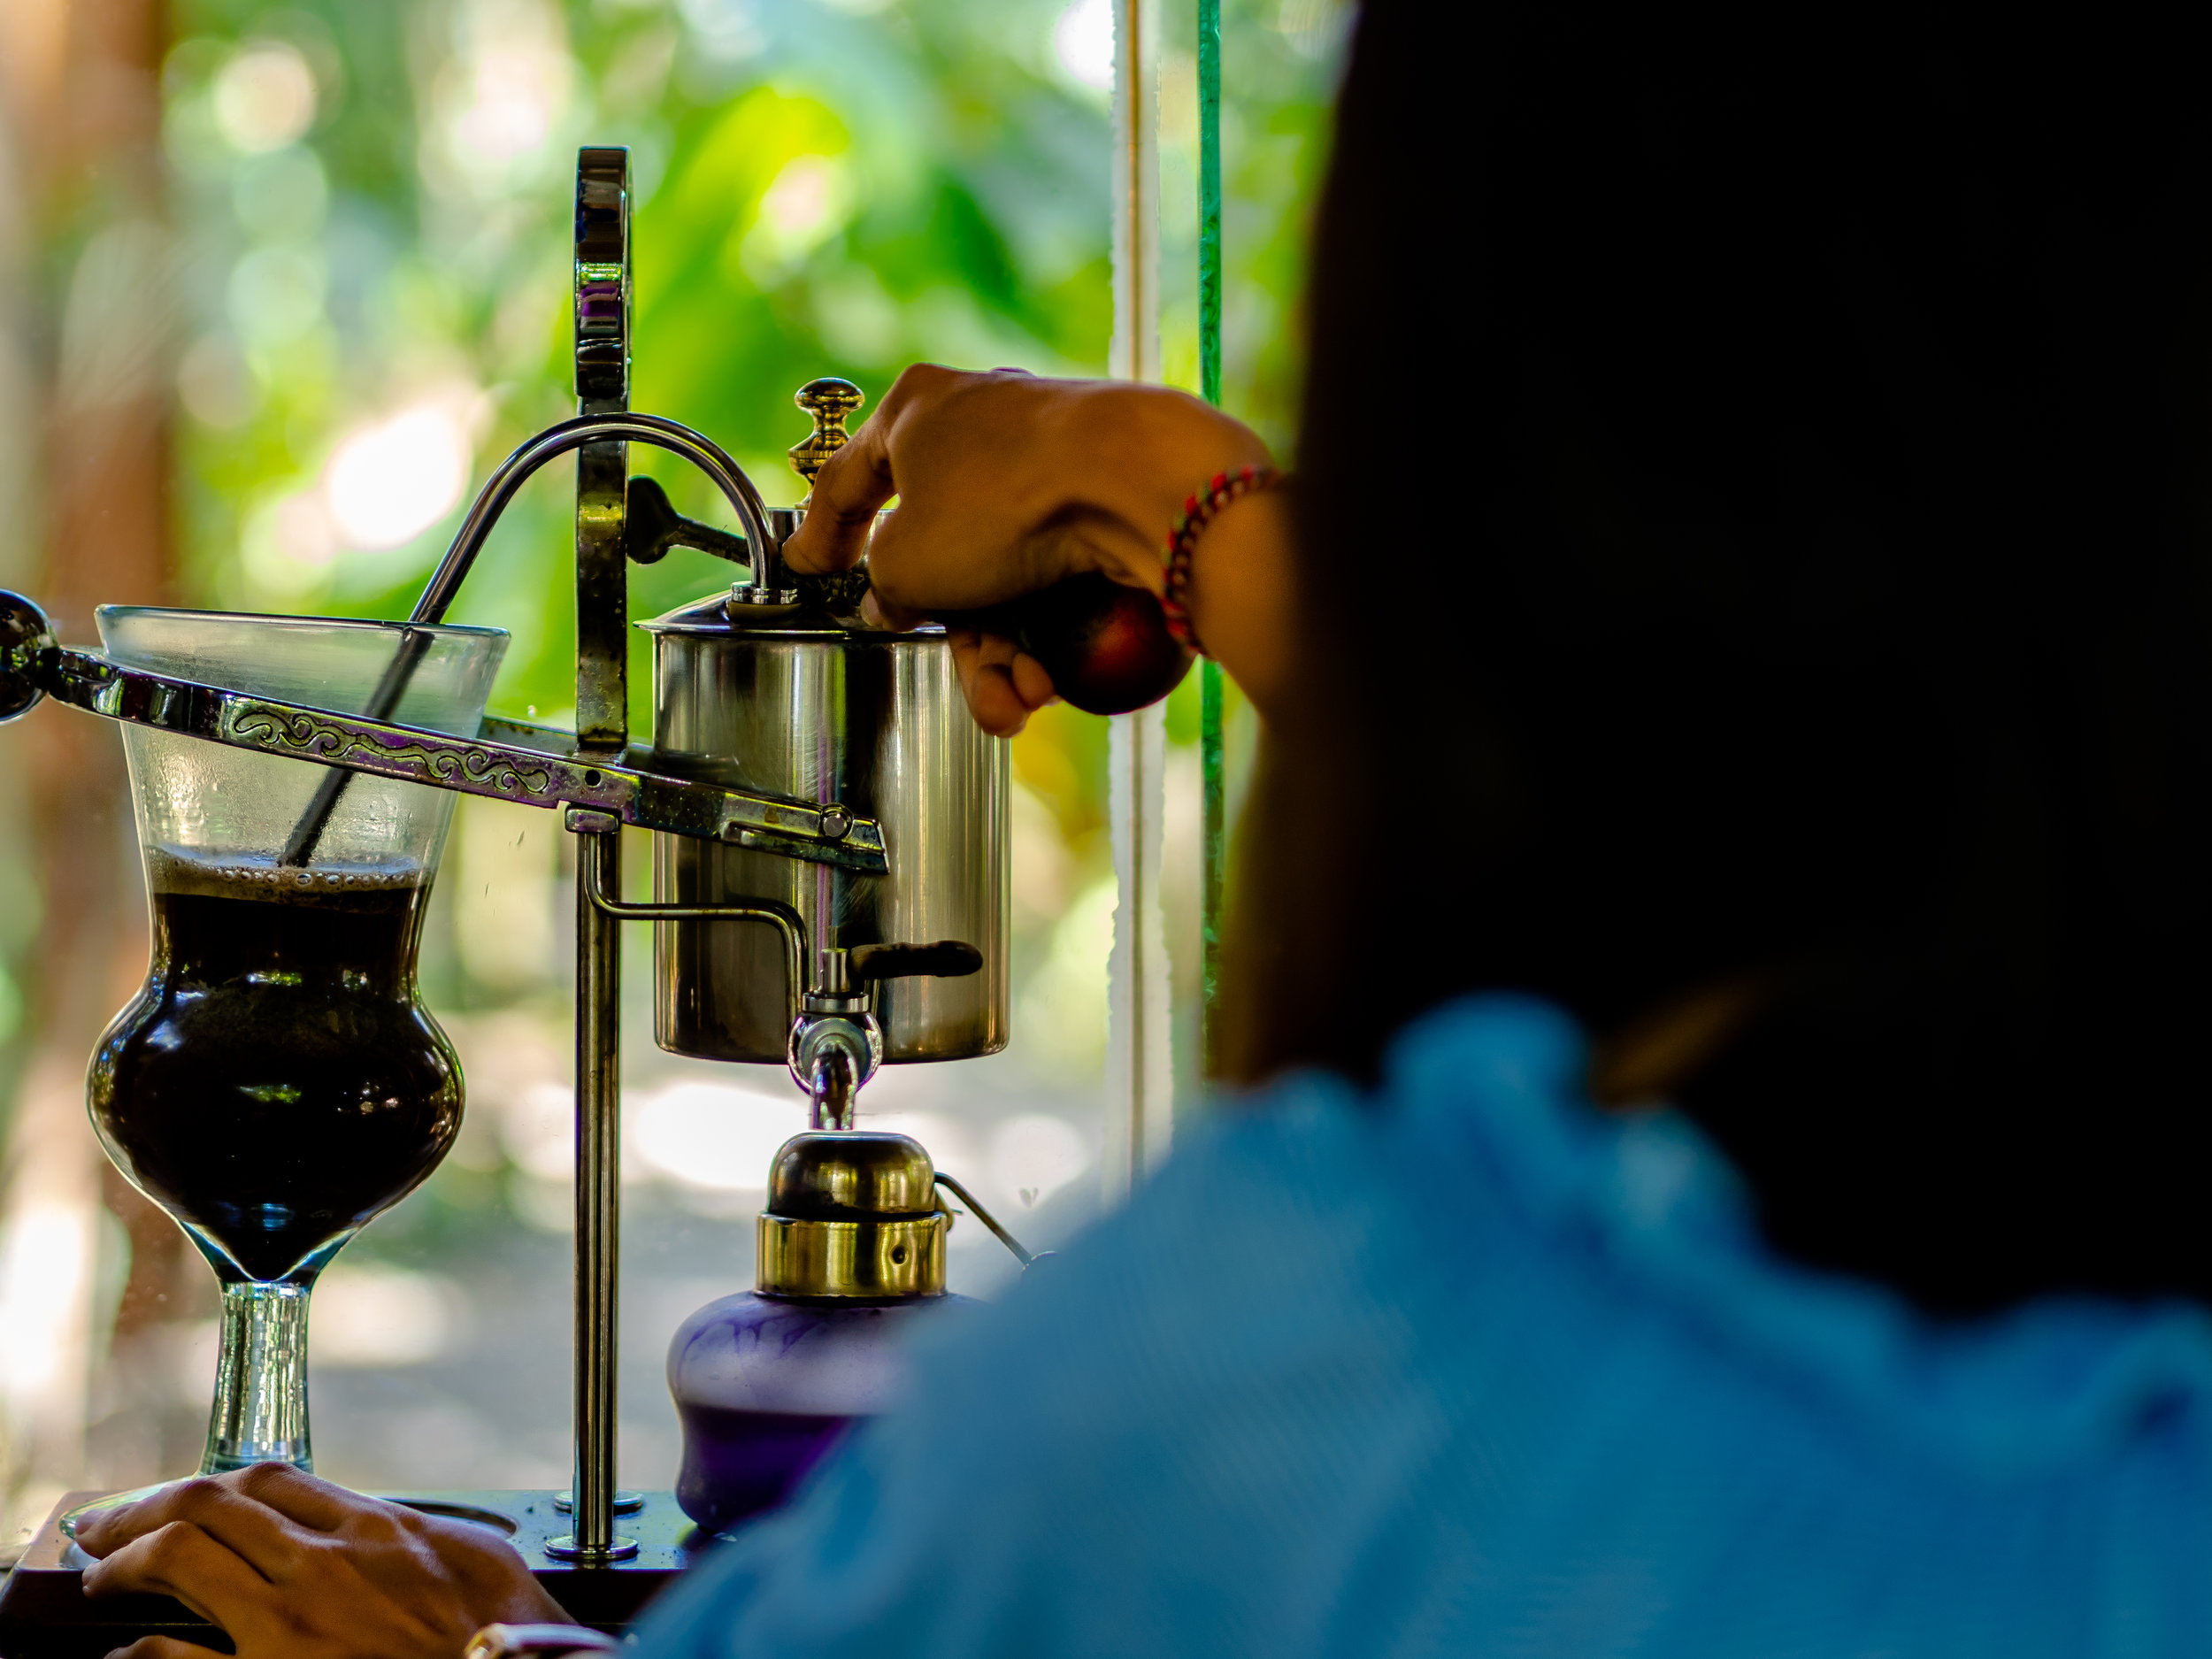 Musings by the Glass - Cat's Tale of Kopi Luwak - Woman Brews Kopi Luwak